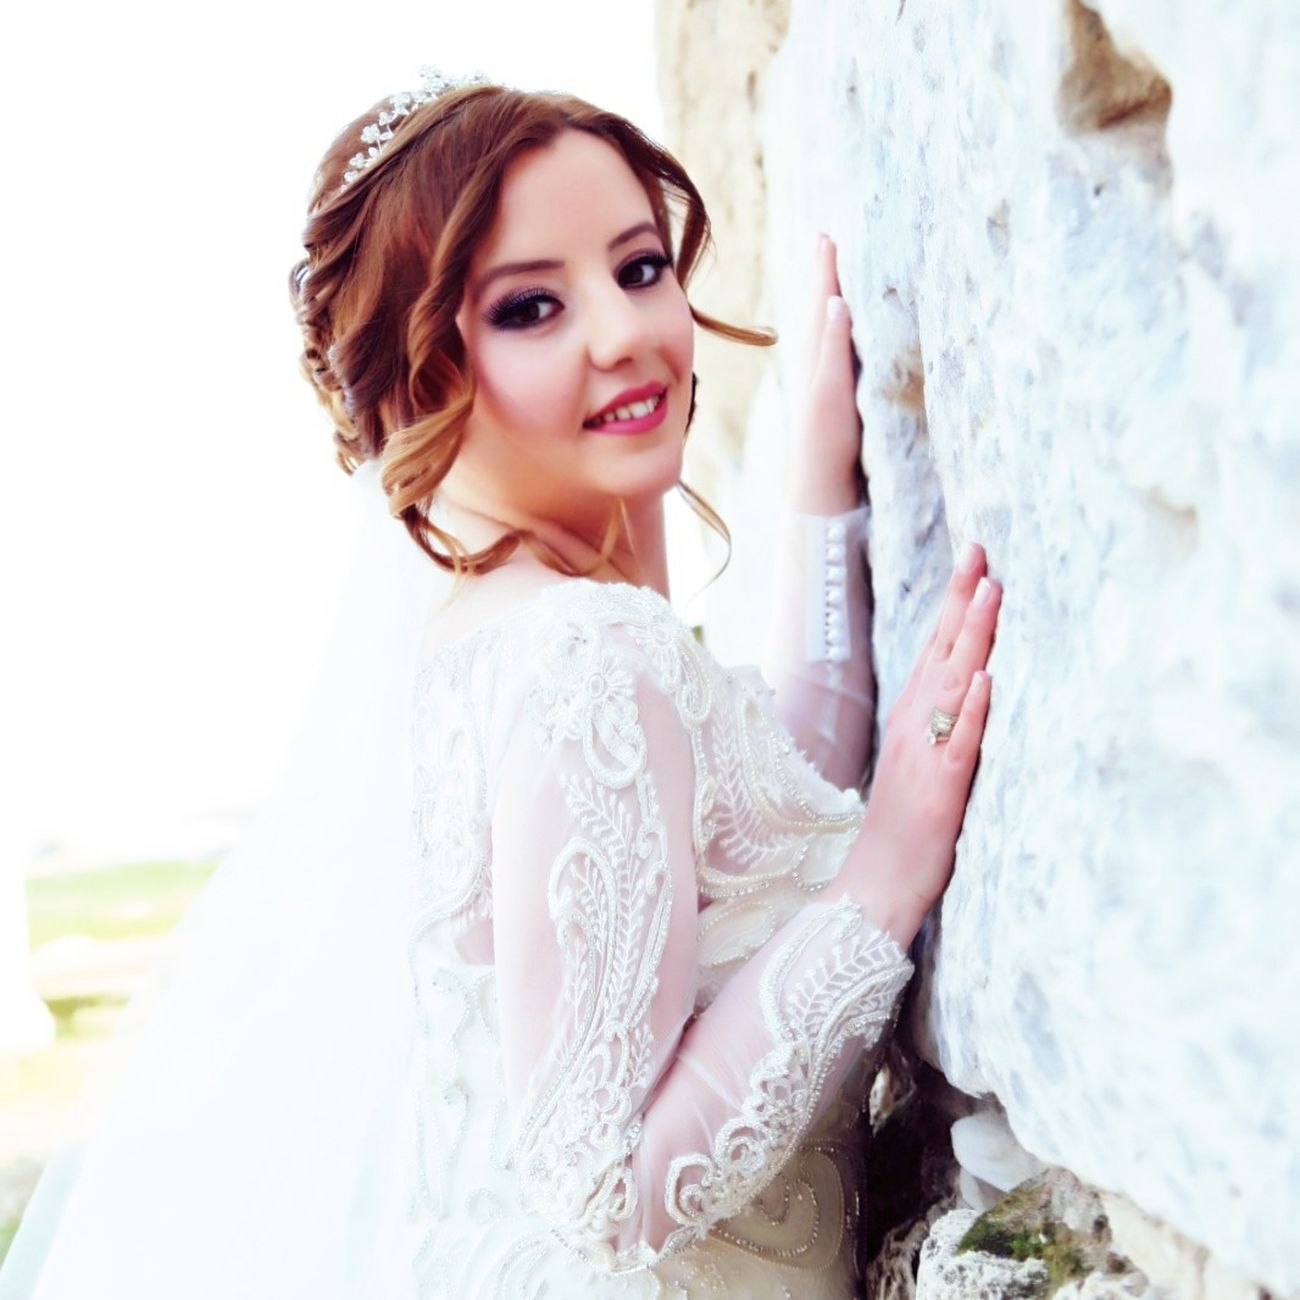 😇 Wedding Photography Wedding Photos Bridal Shower Bridalmakeup Bridalcollection2016 Relaxing Lovelovelove First Eyeem Photo Eyemphotography Eyem Gallery EyeEm Best Shots Justmarried💑